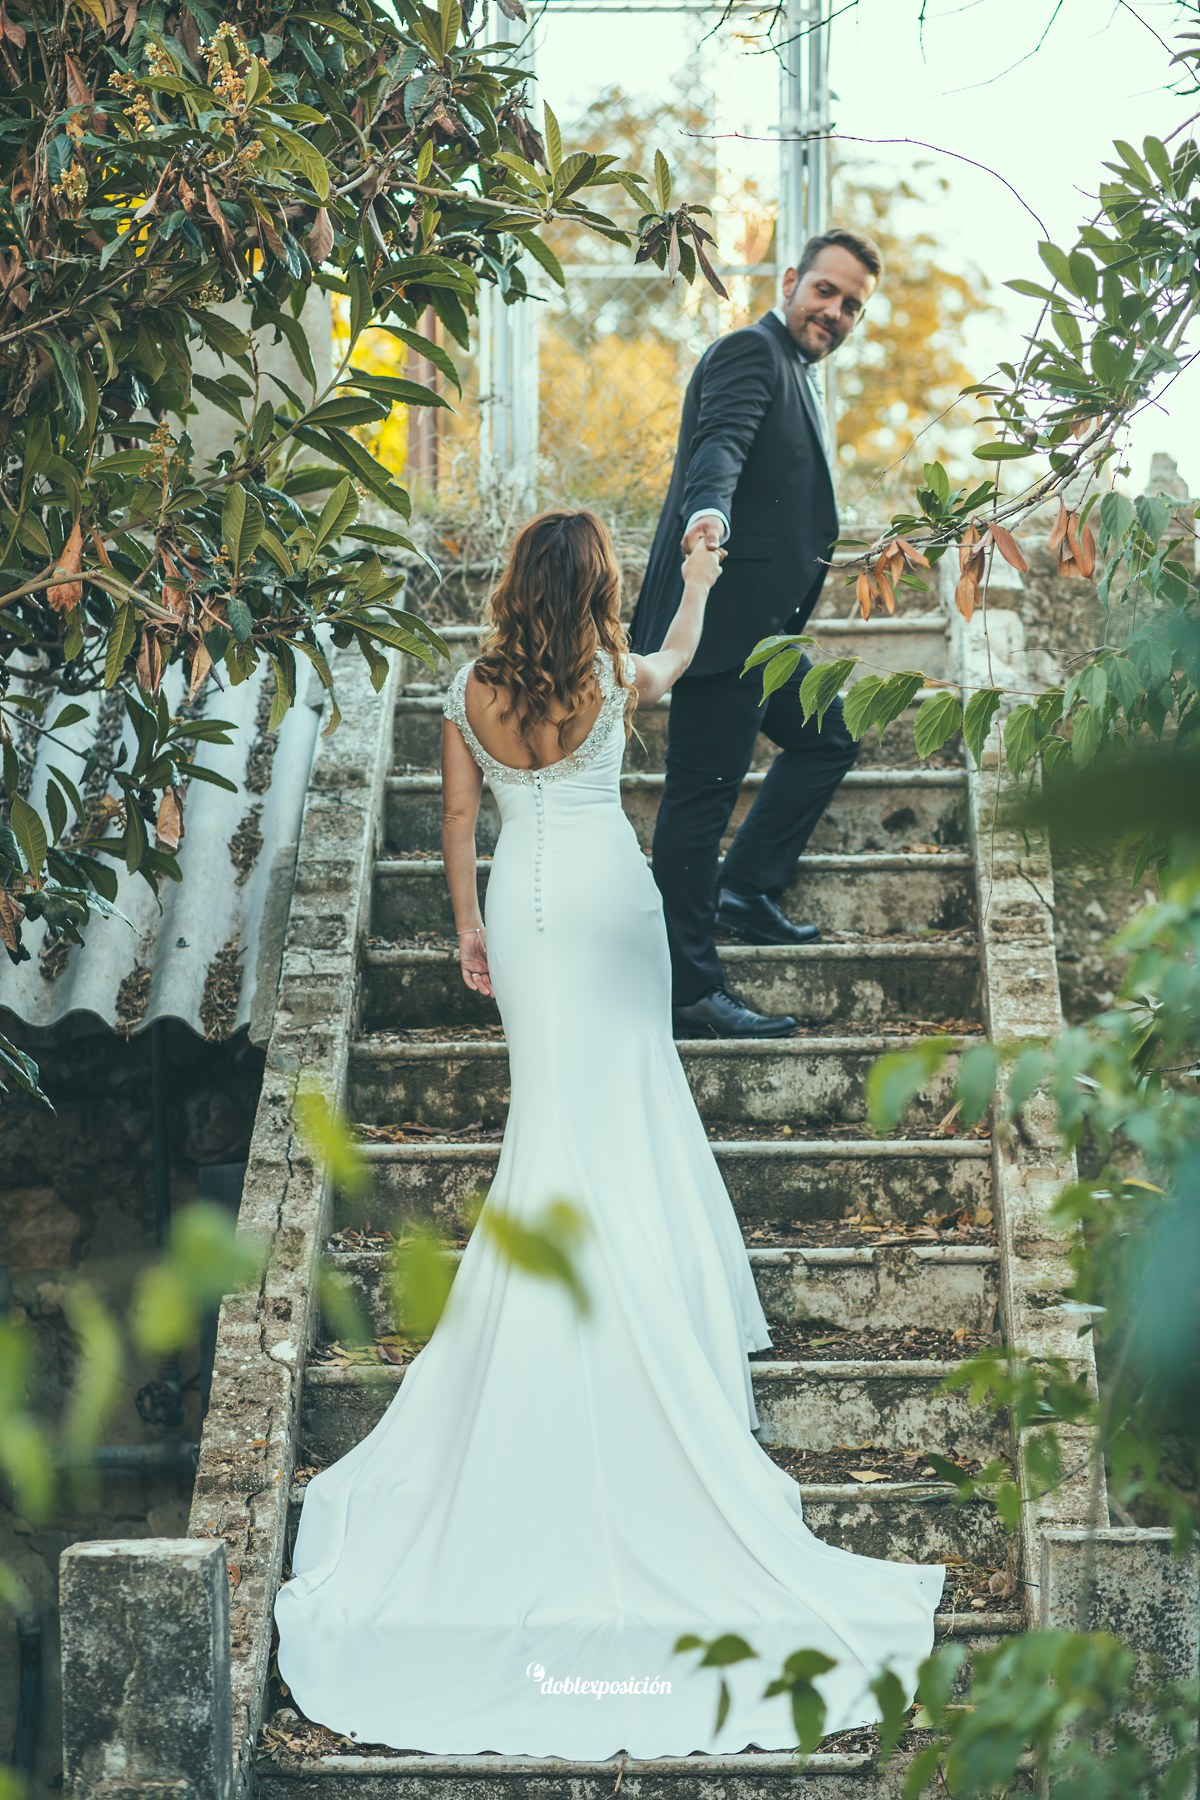 fotografos-boda-elche-alicante-reportaje-bosque-postboda-016